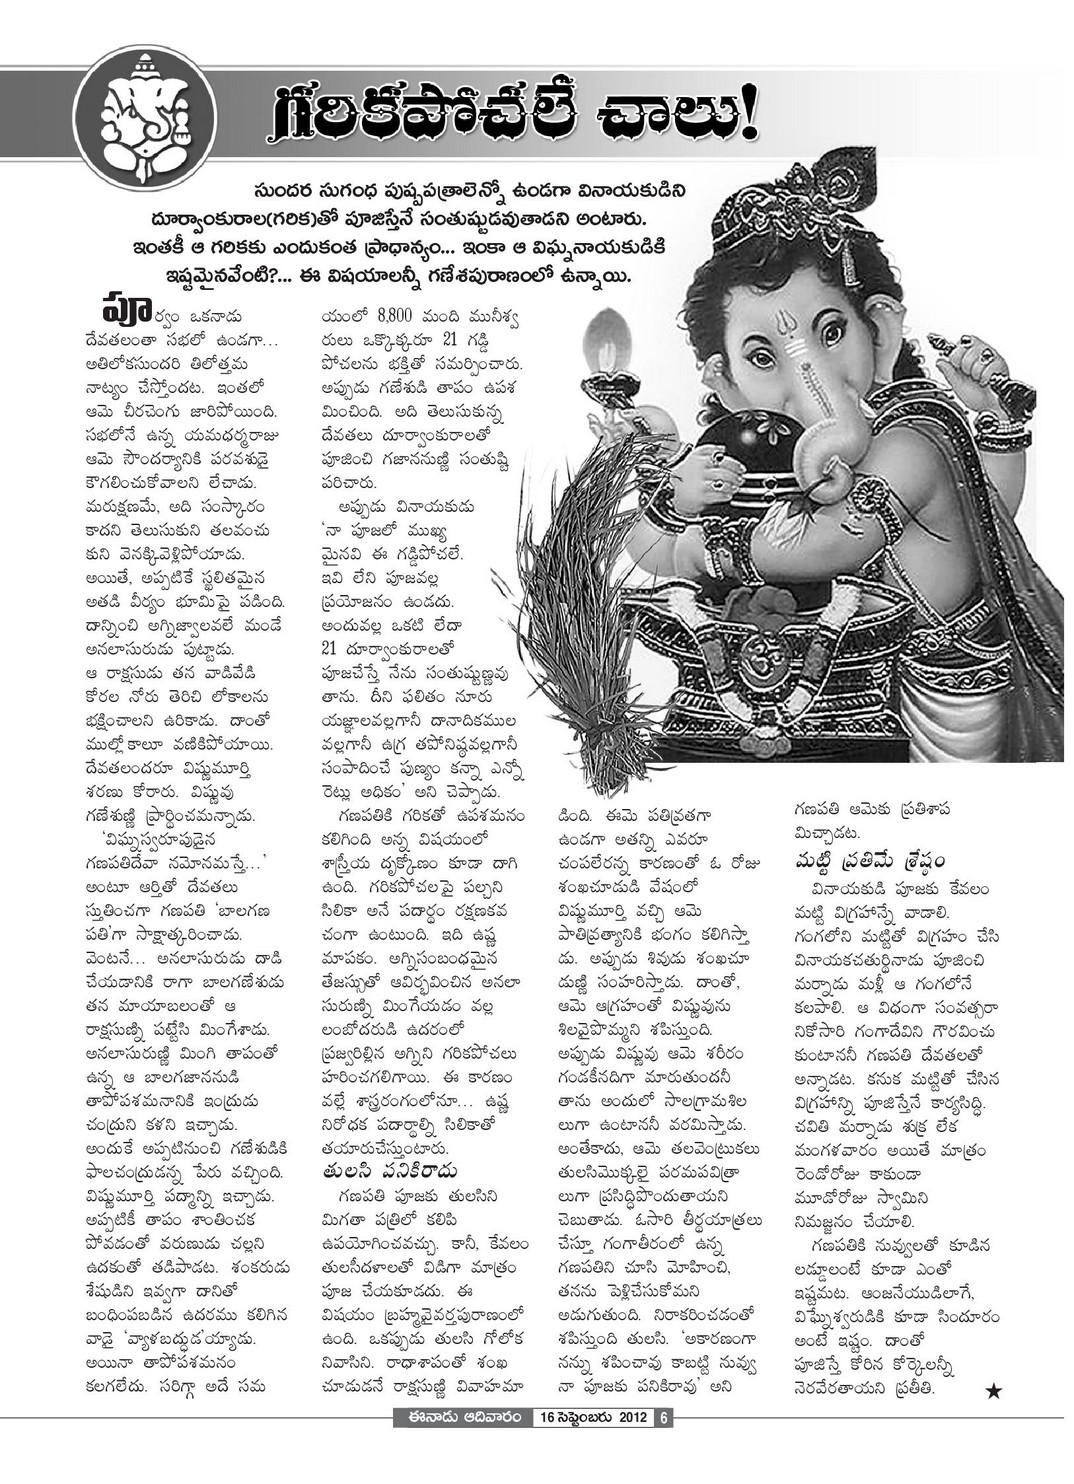 Durga: VINAYAKA CHAVITHI SPECIAL ARTICLE @ EENADU SUNDAY BOOK!